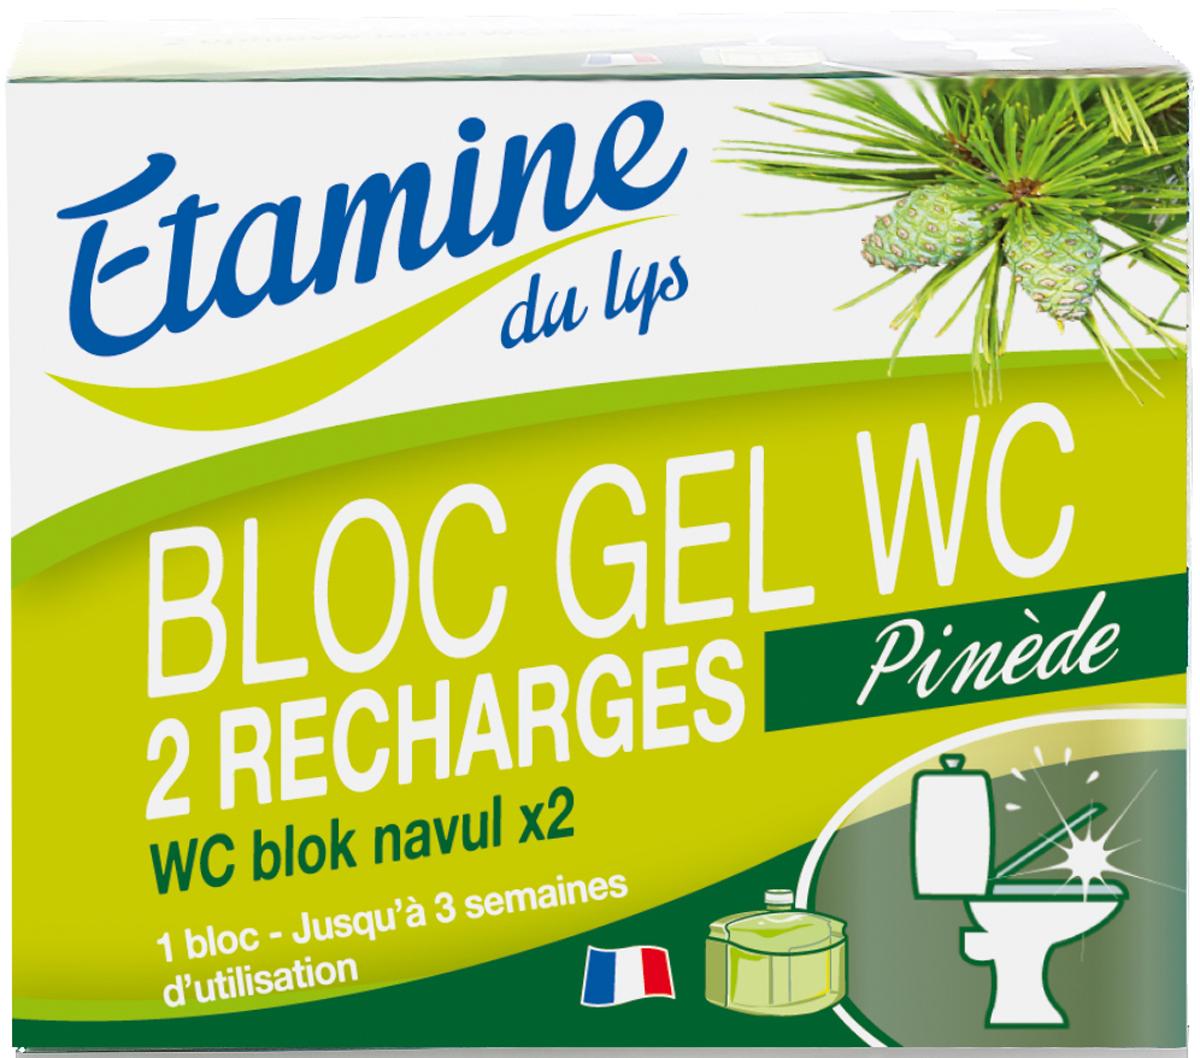 "Запасной флакон для блок-геля для туалетов ""Etamine du Lys"", 2 х 50 мл"